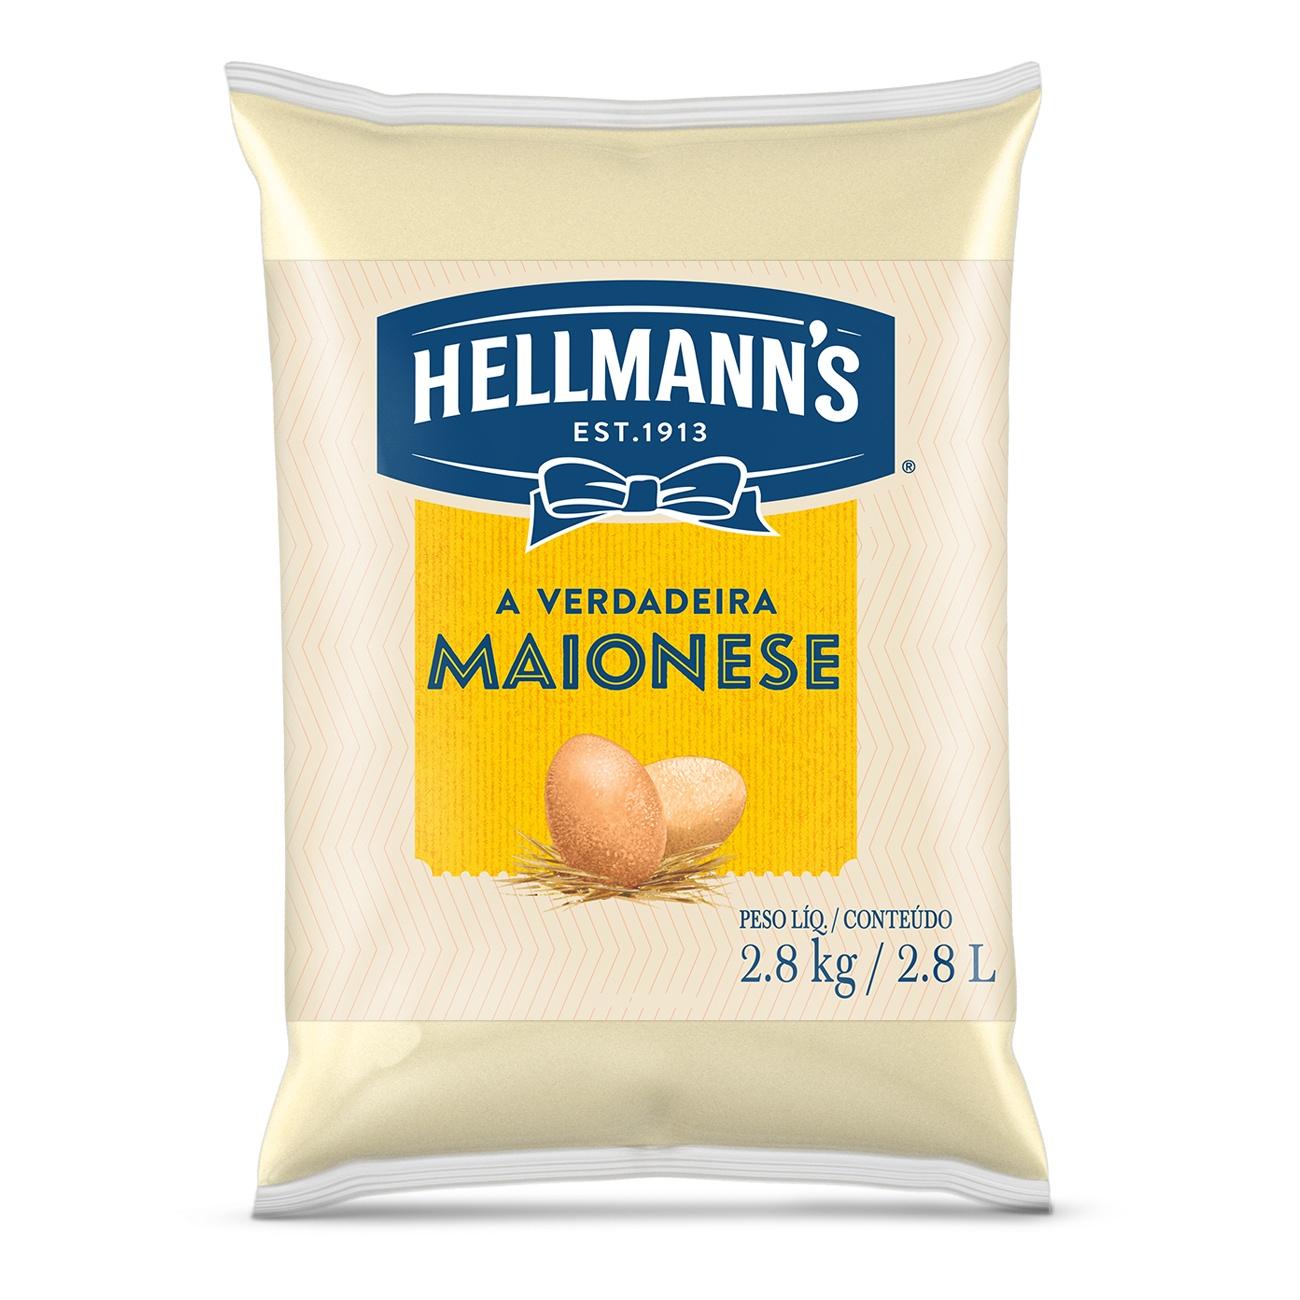 Maionese Hellmann's Saco 2,8kg